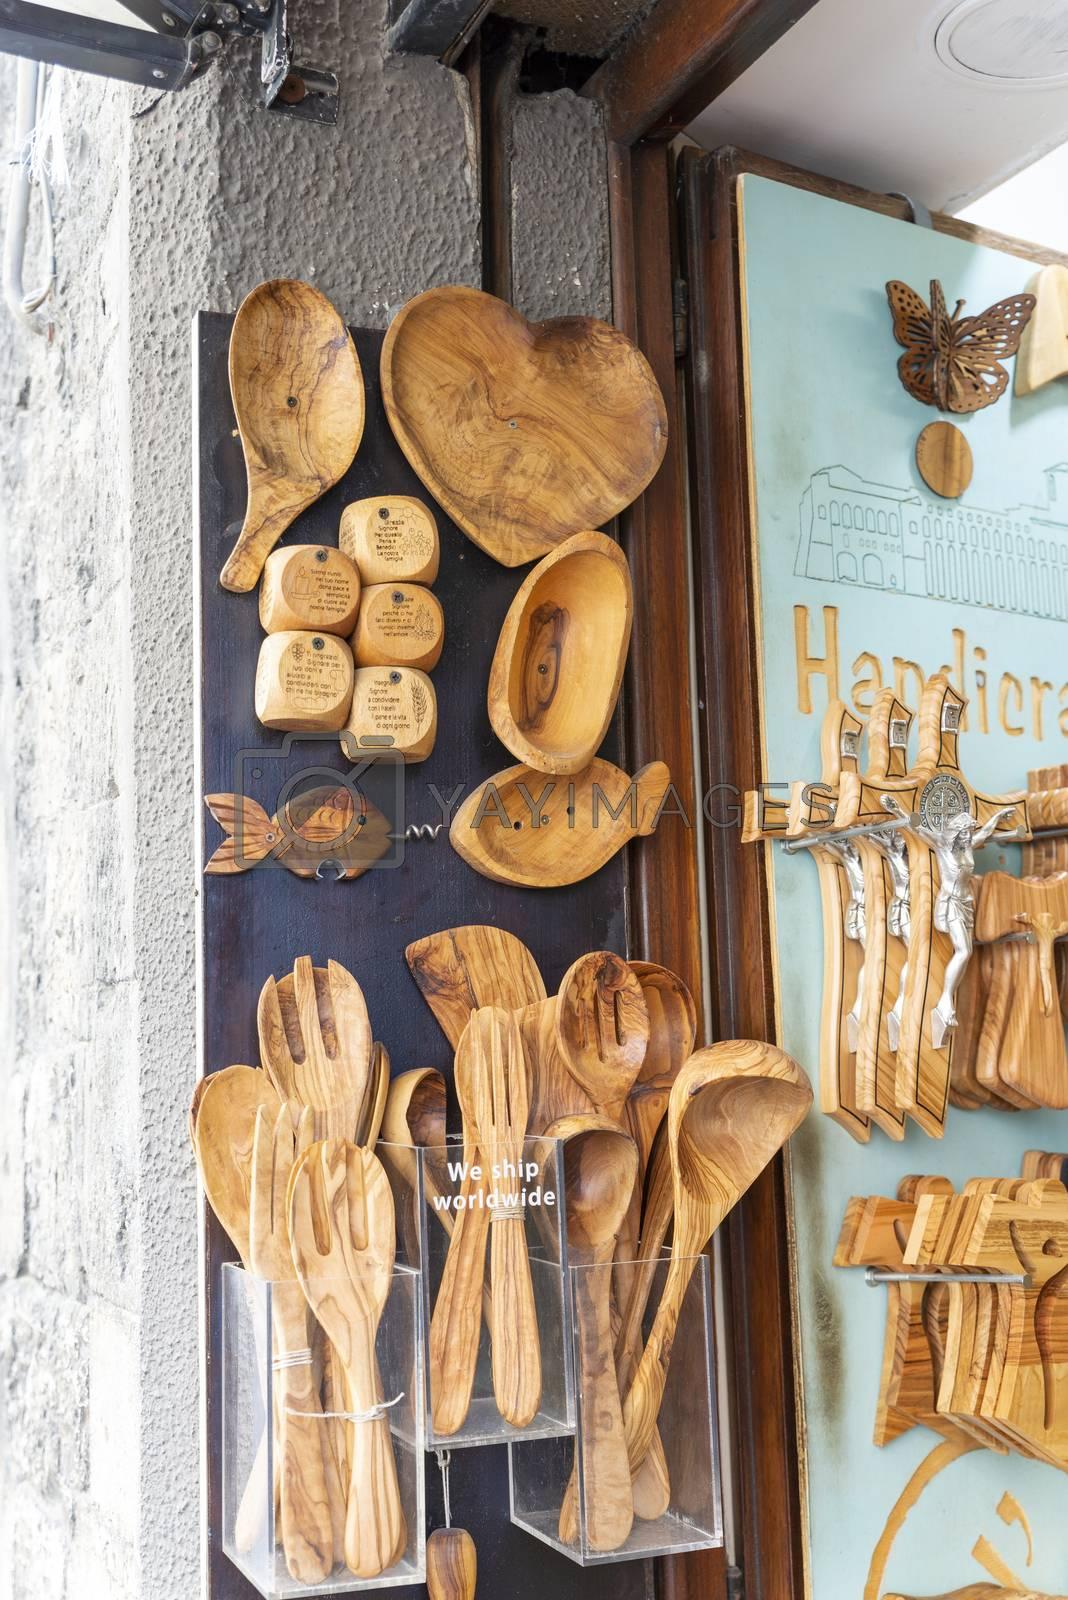 assisi,italy july 11 2020:handmade wooden kitchen utensils